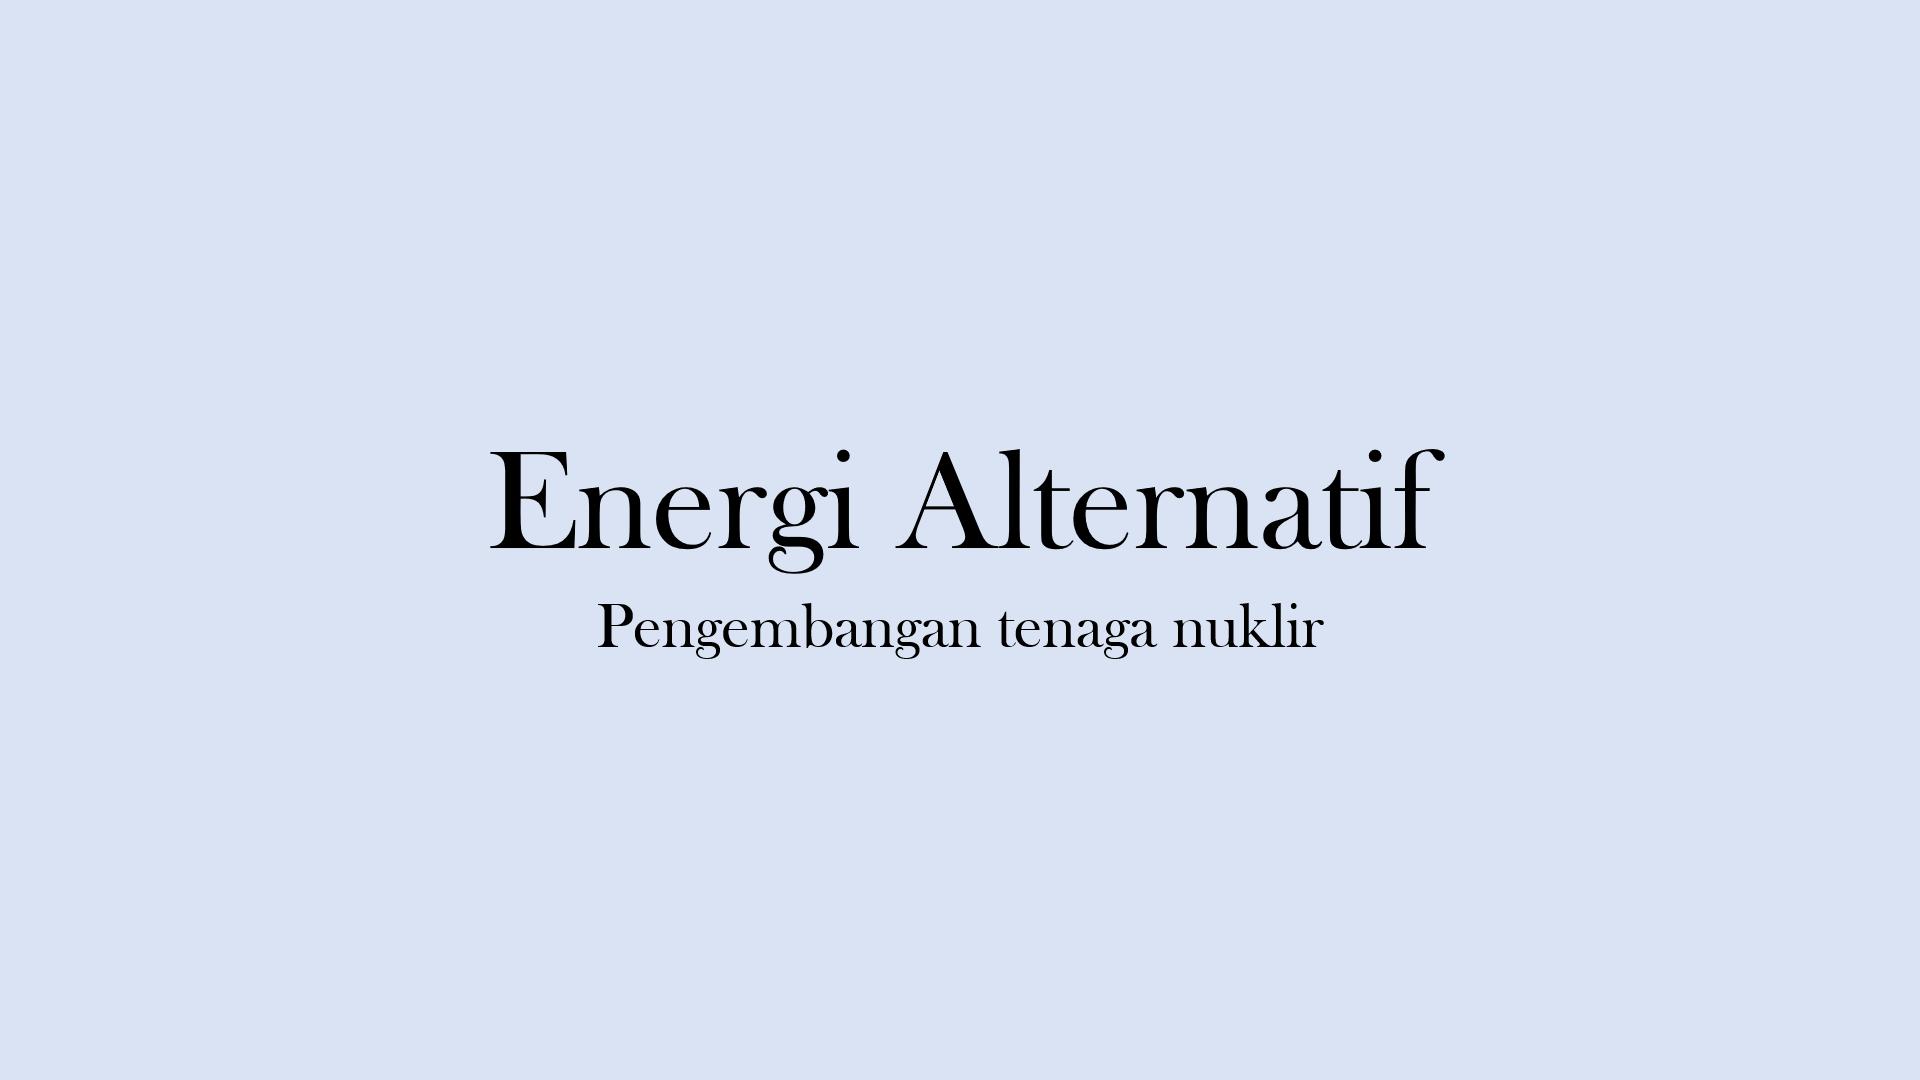 Mengembangkan Tenaga Nuklir sebagai Energi Alternatif